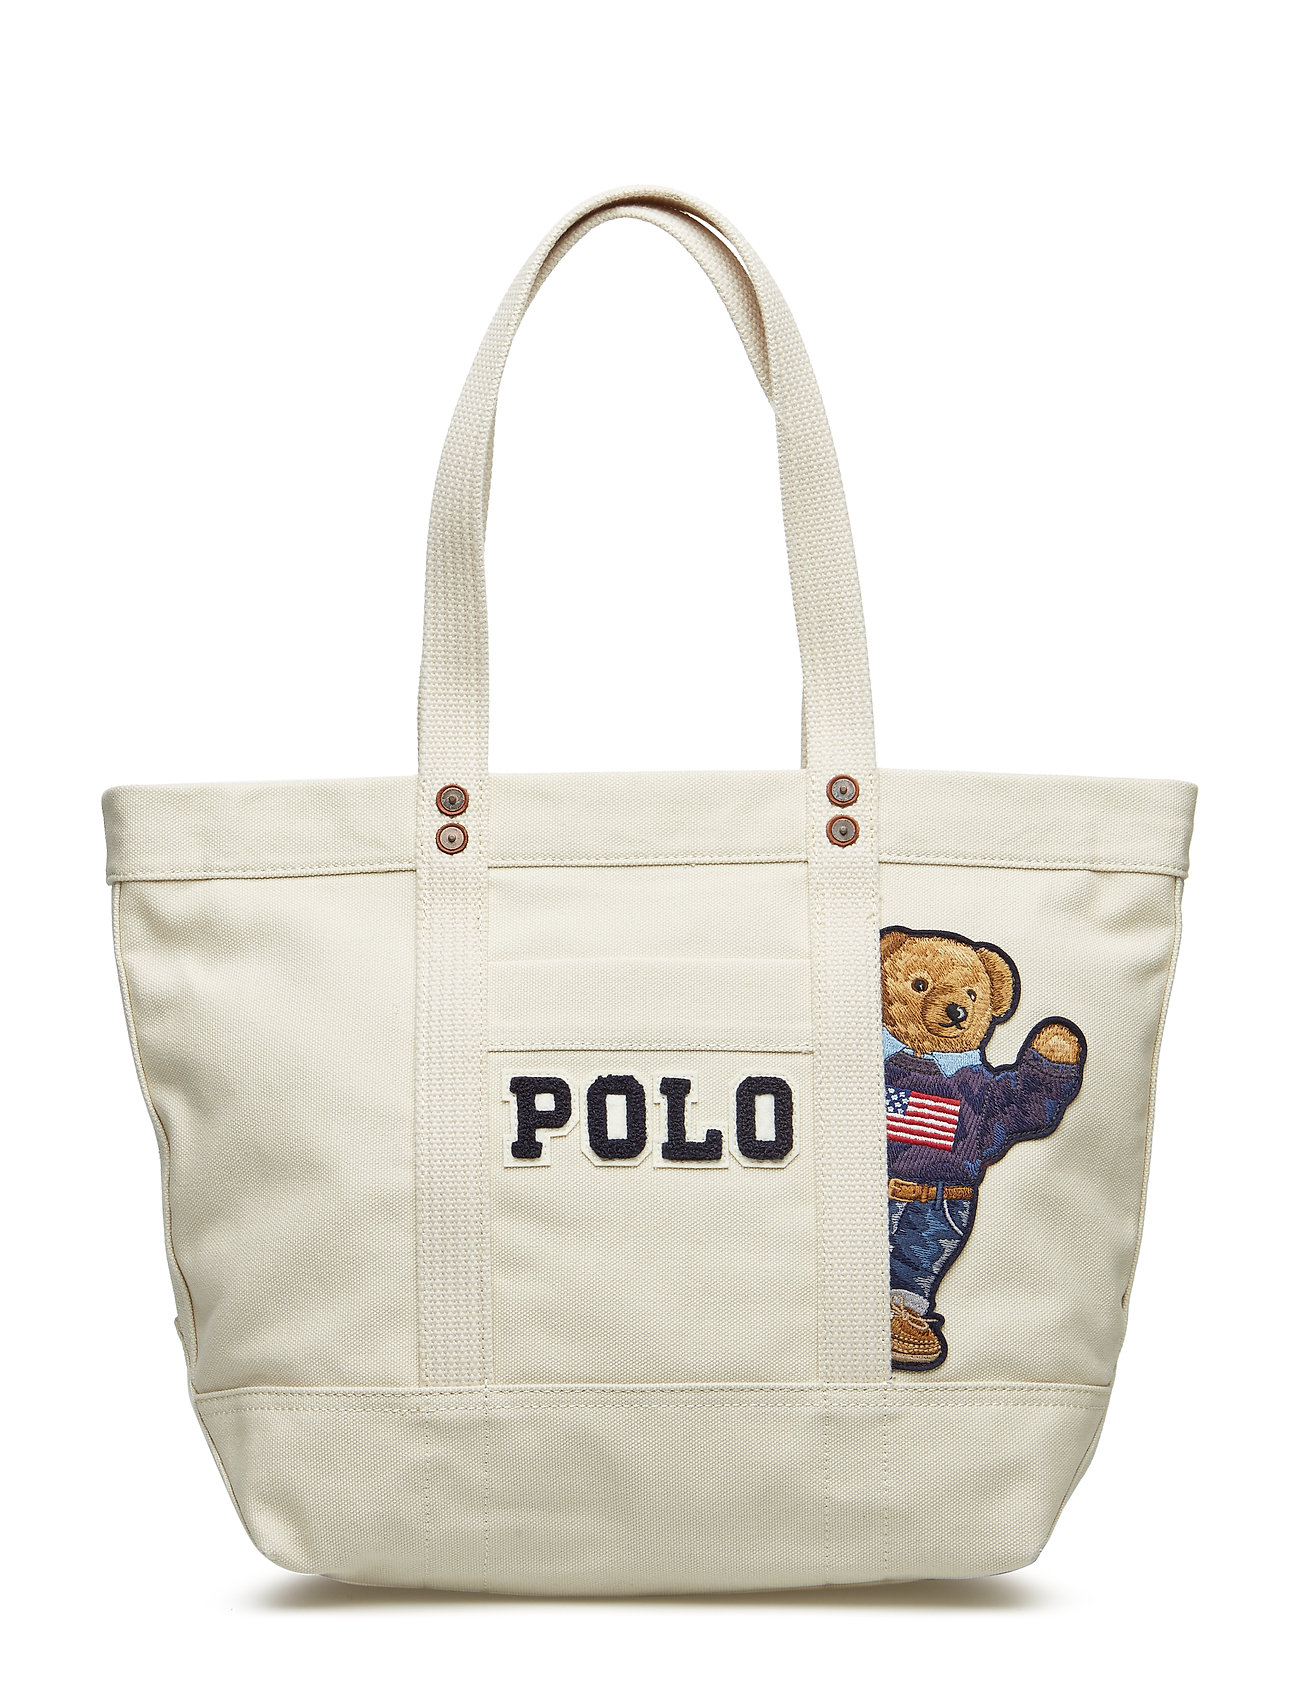 62d0b8db4d4 Canvas Bear-pp Tote-tte-med (Cream) (169.95 €) - Polo Ralph Lauren ...